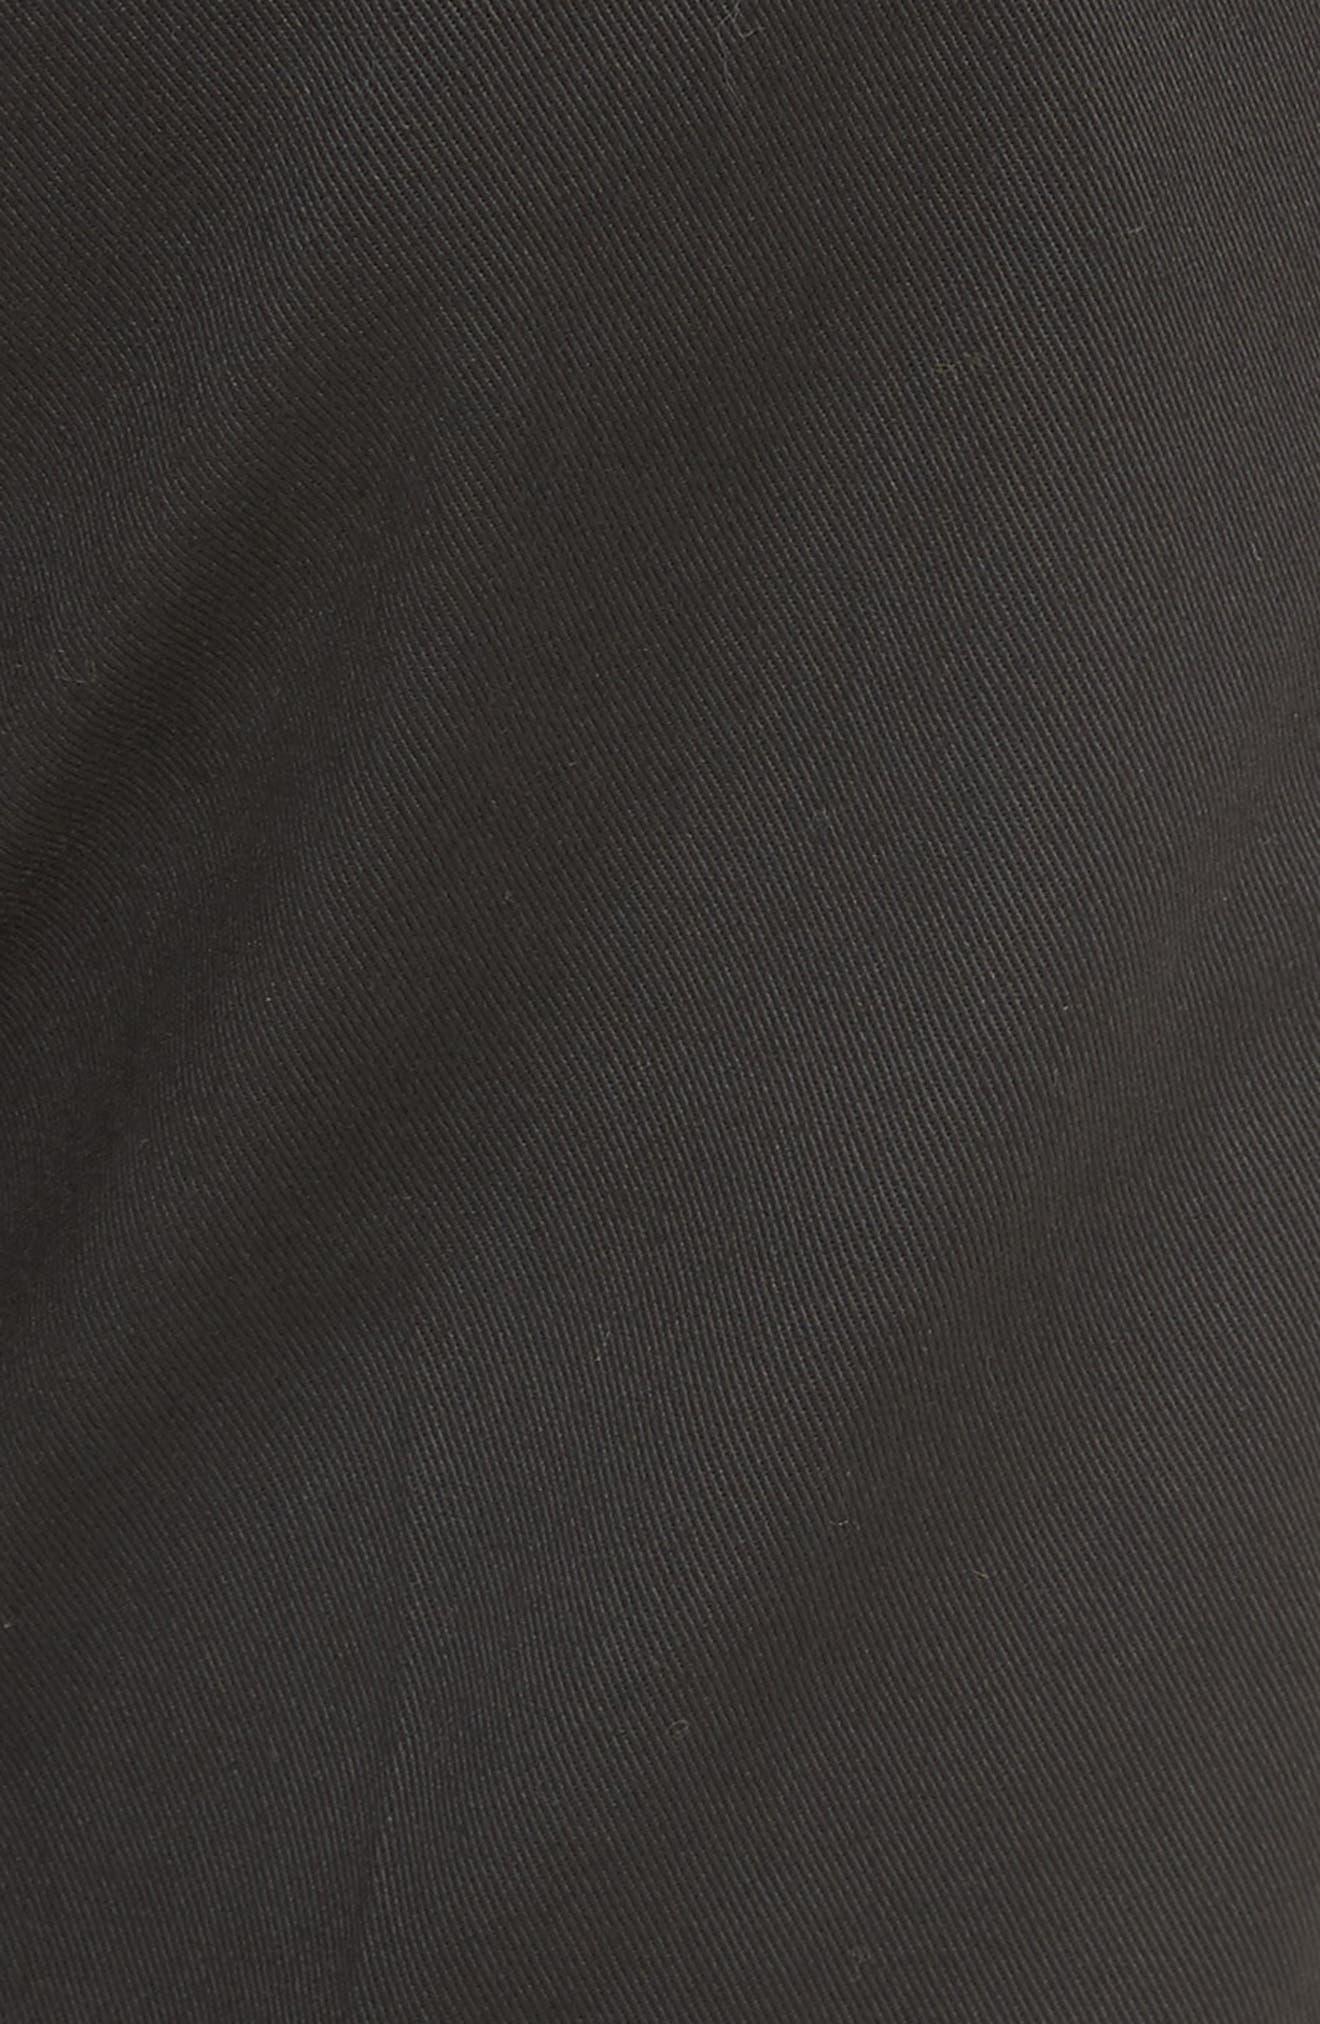 Dan Skinny Fit Cropped Trousers,                             Alternate thumbnail 5, color,                             Black